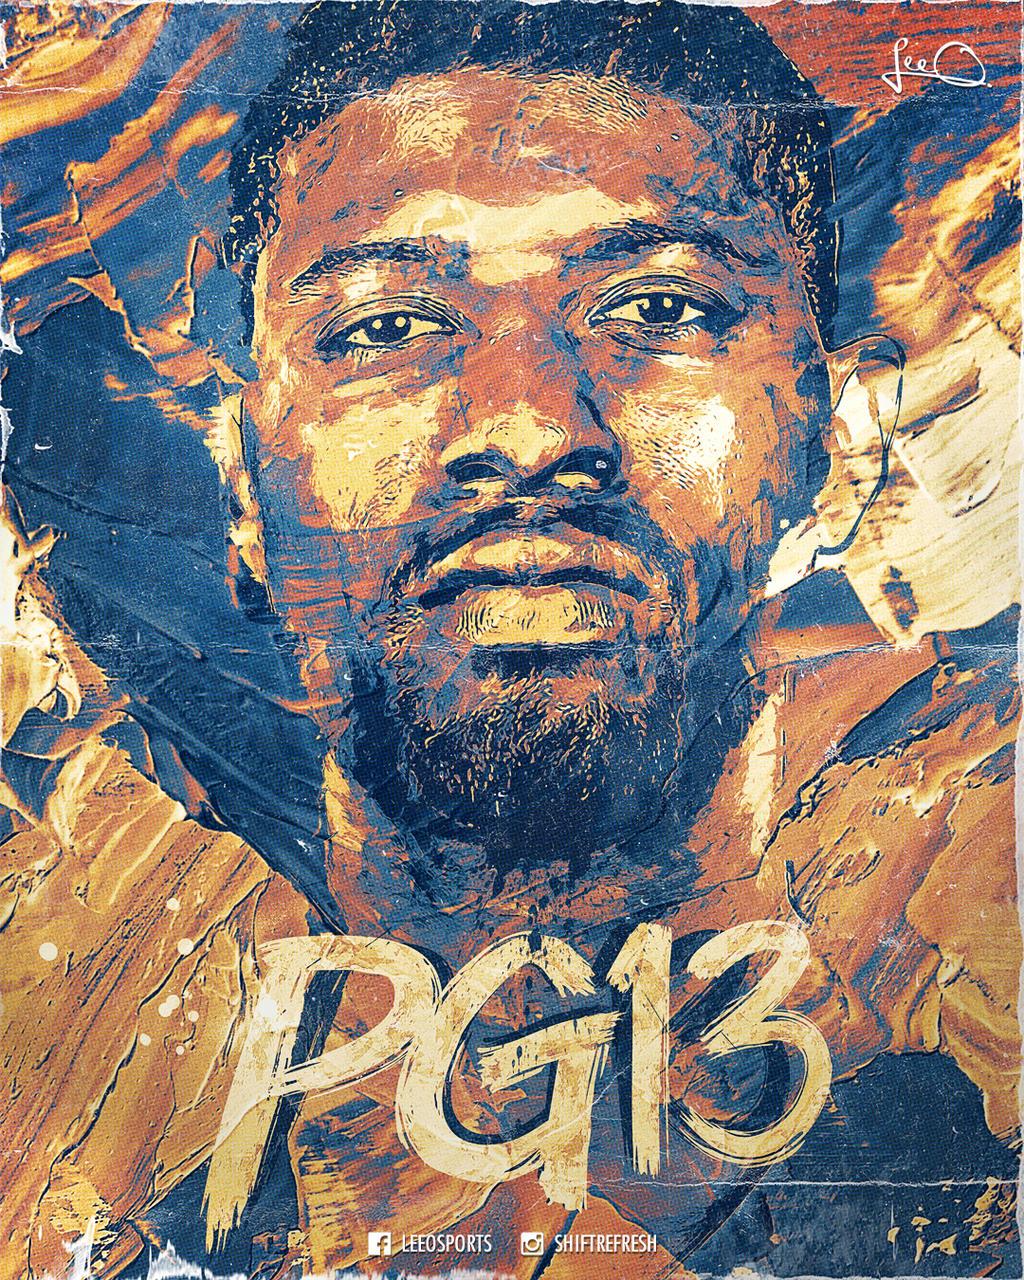 Okc Thunder Wallpaper Hd: Paul George OKC NBA Poster Design By Skythlee On DeviantArt